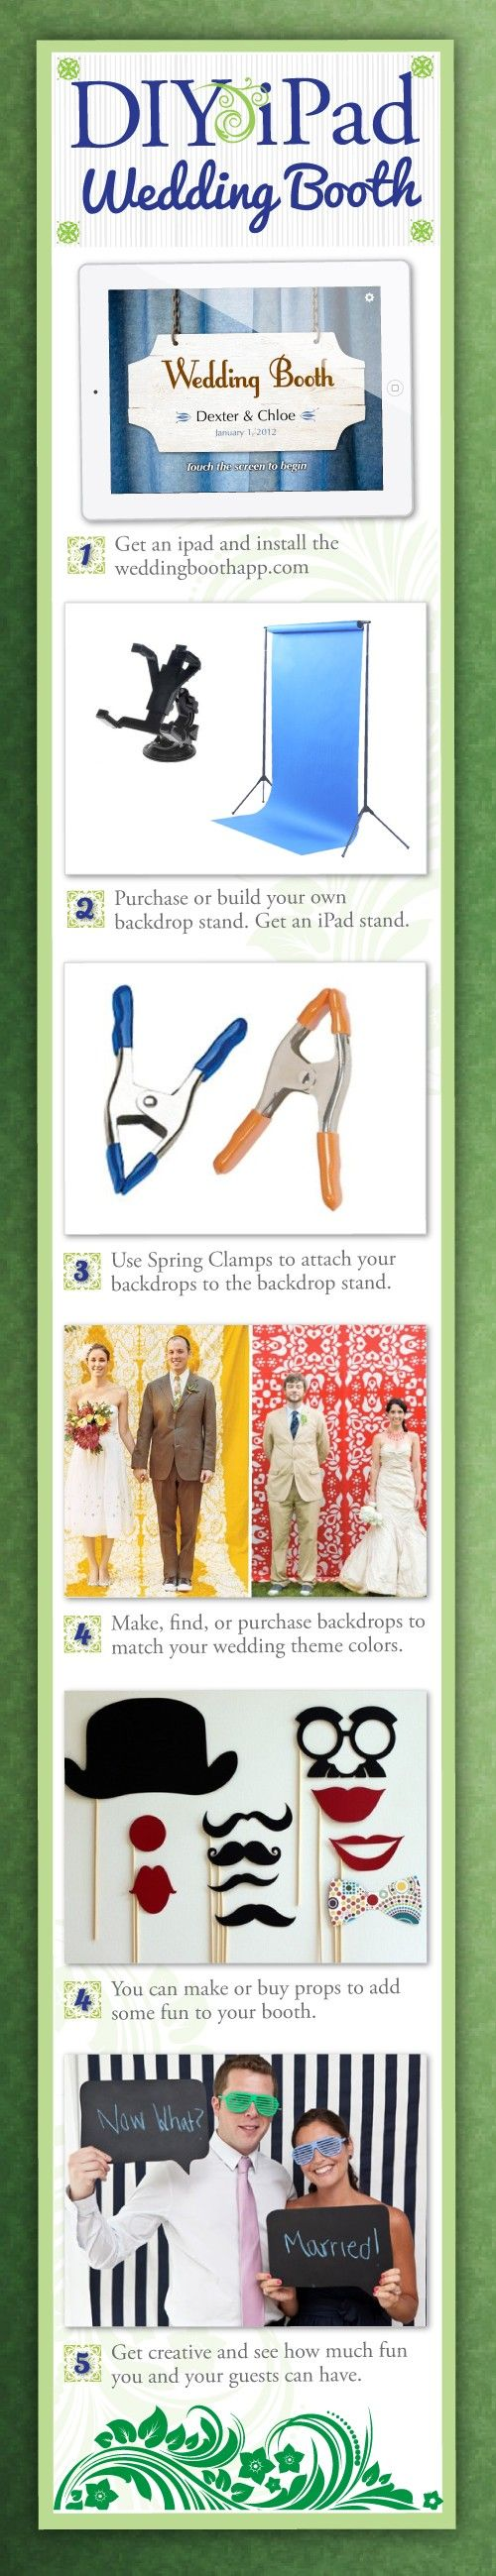 DIY wedding photo booth!